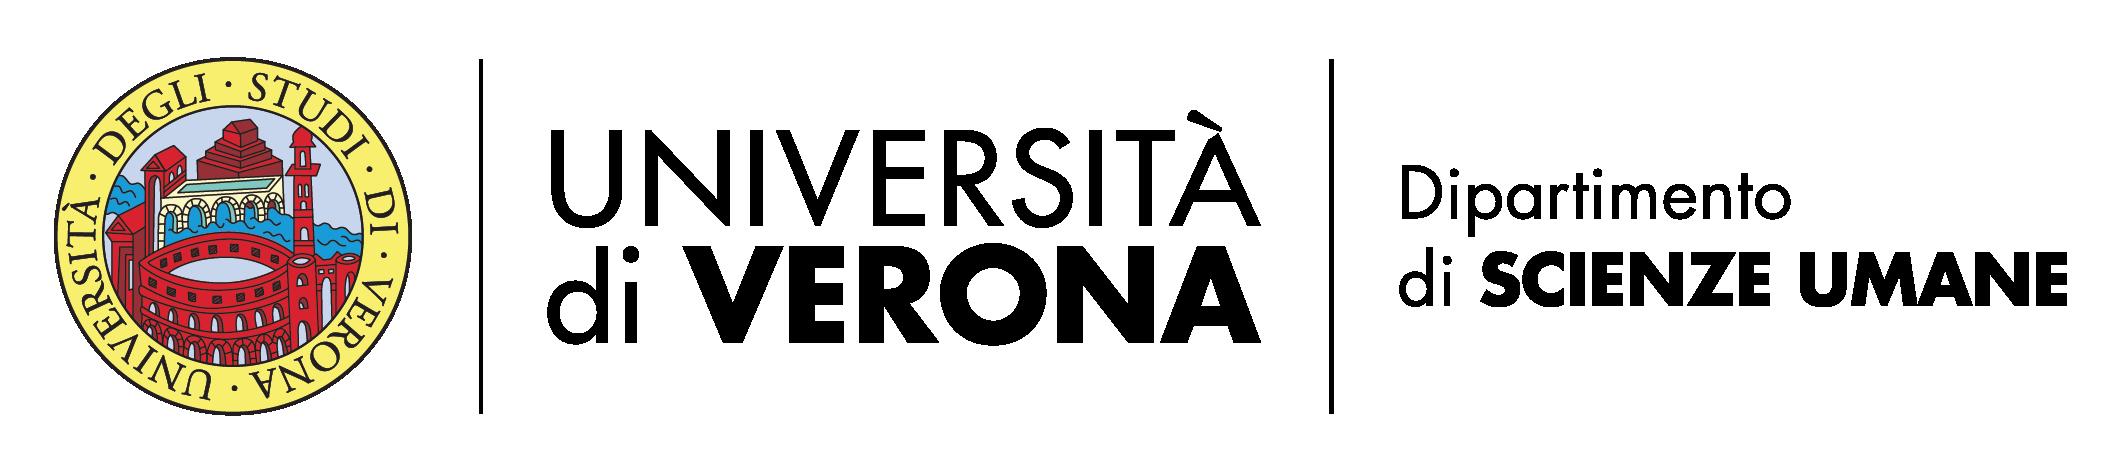 Psicologi in Piazza Verona Logo Univr Dip Scienze Umane colorato